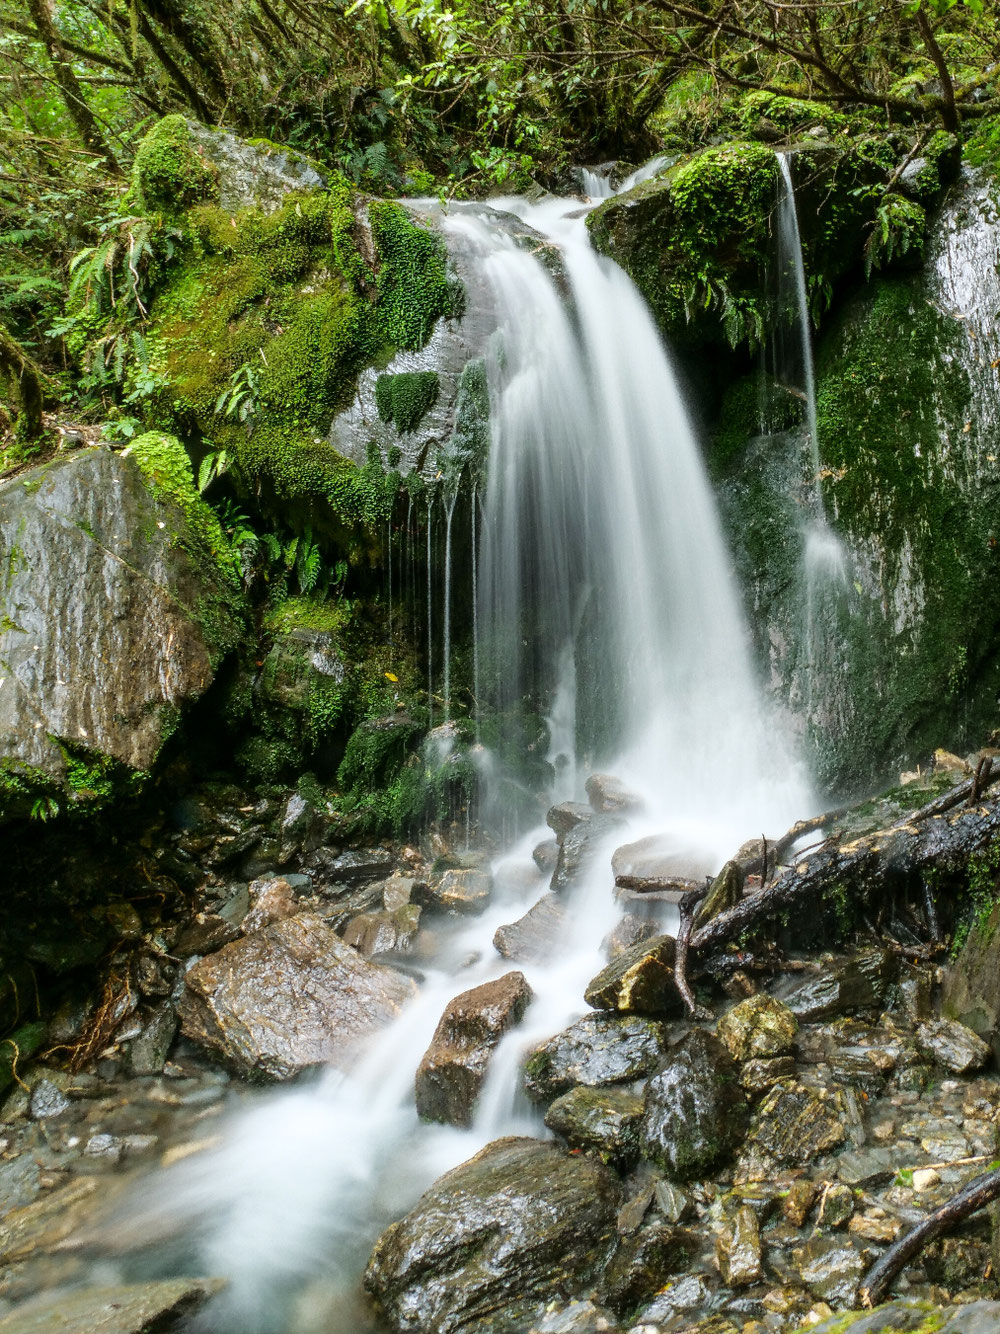 Waterfall on the way